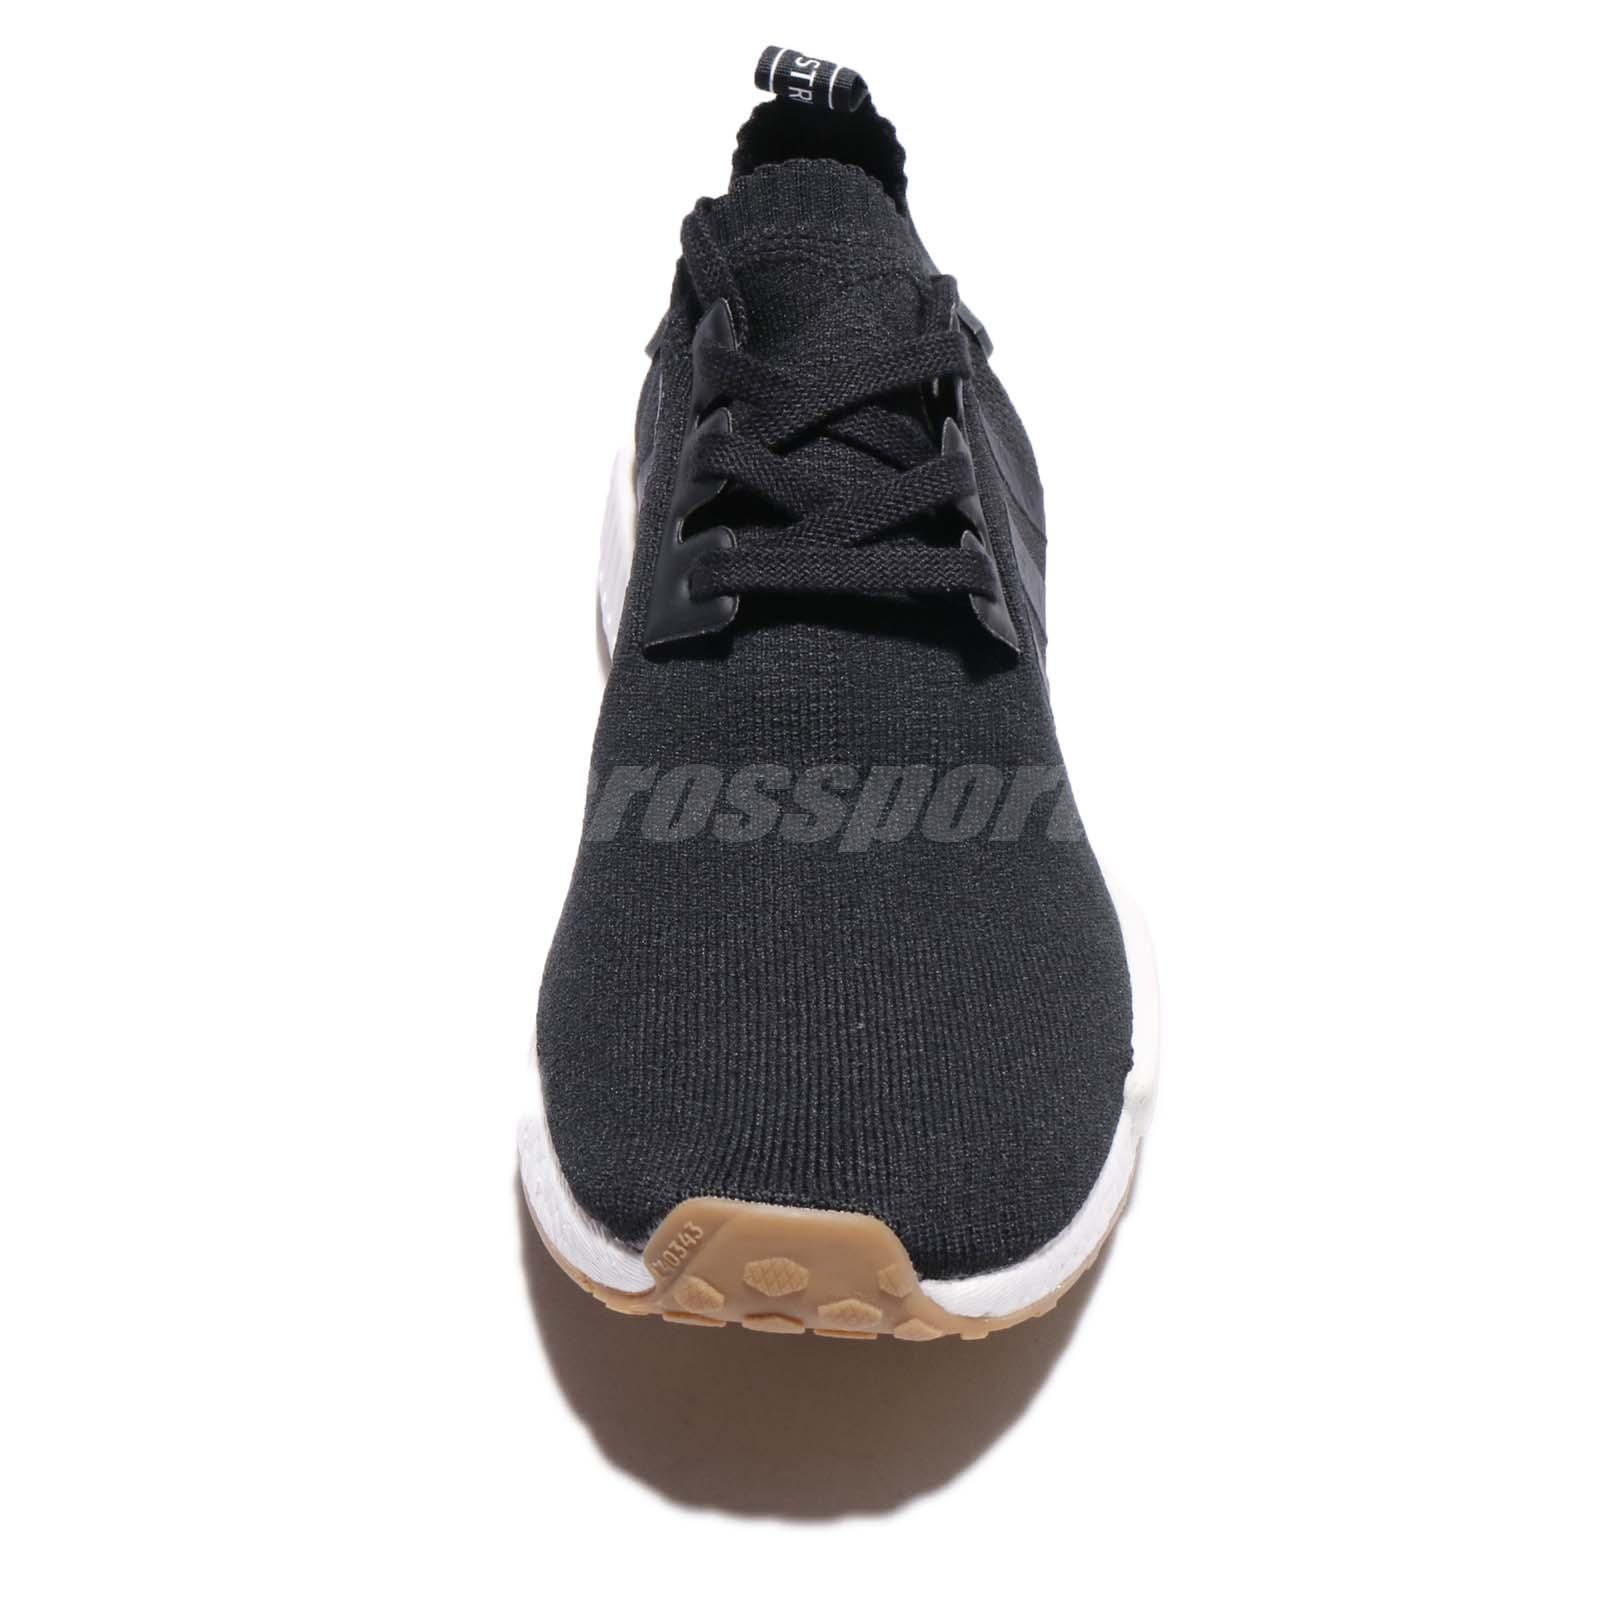 timeless design f8992 6f01b adidas Originals NMD R1 PK PrimeKnit BOOST Black Gum Men Running ...